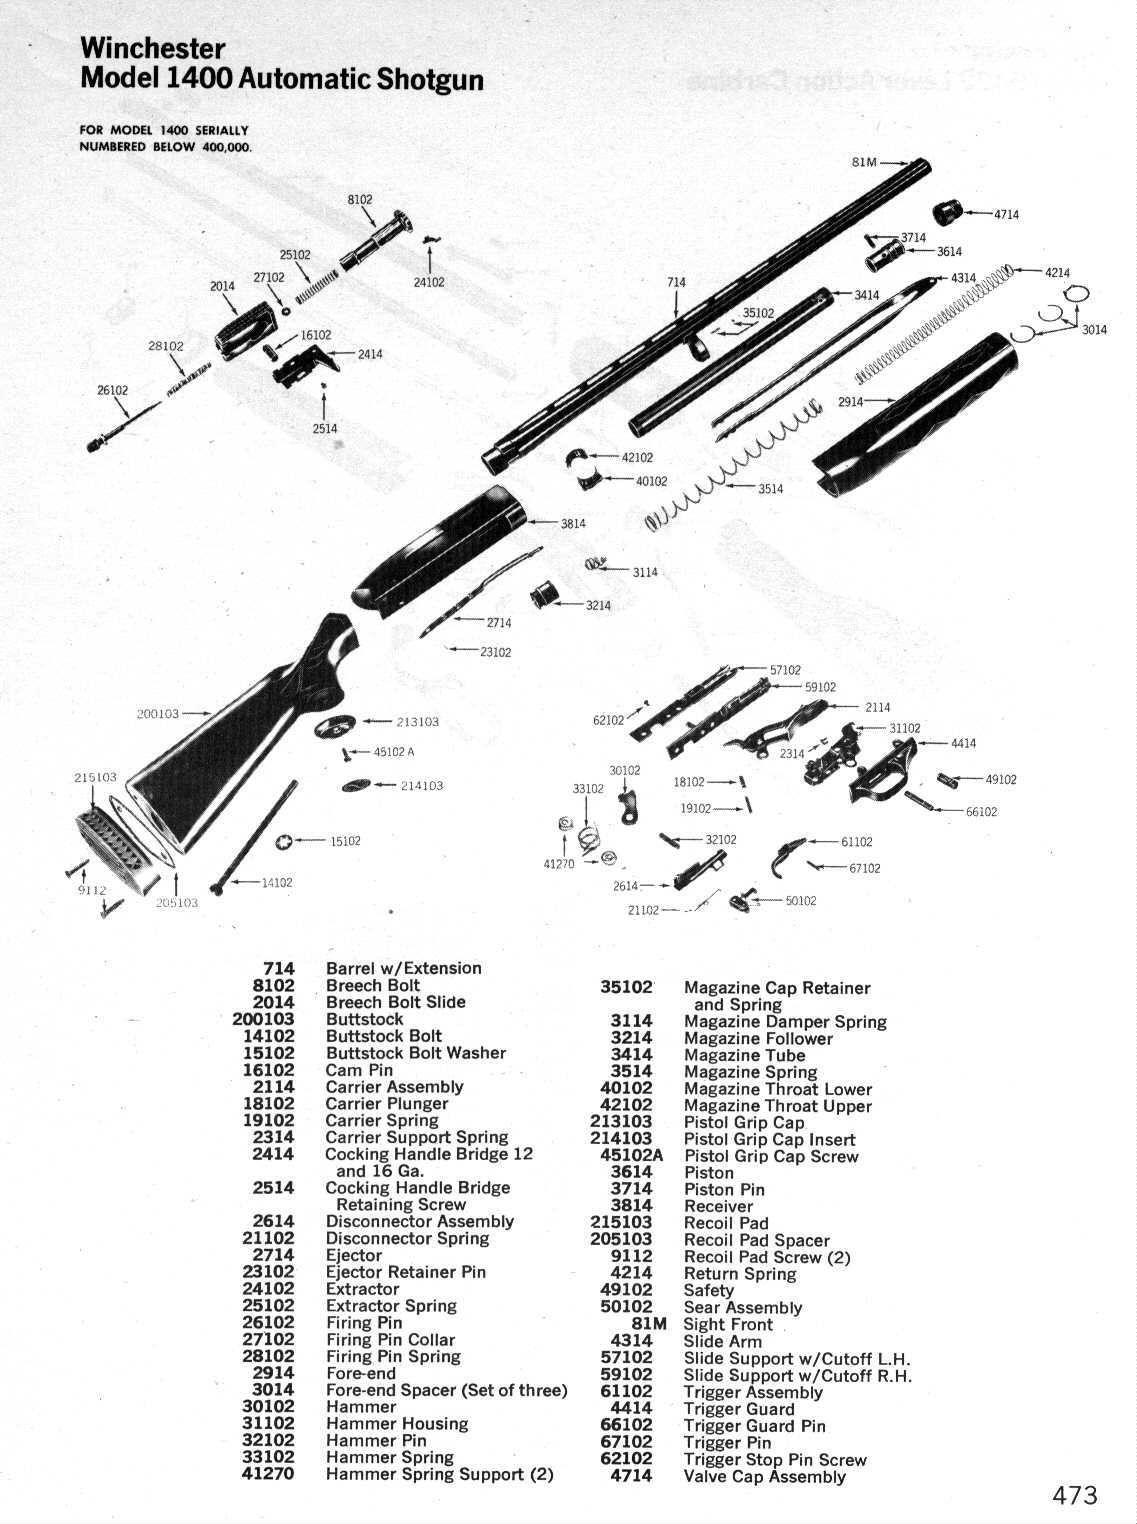 SN_6347] Winchester Schematic Download Diagram